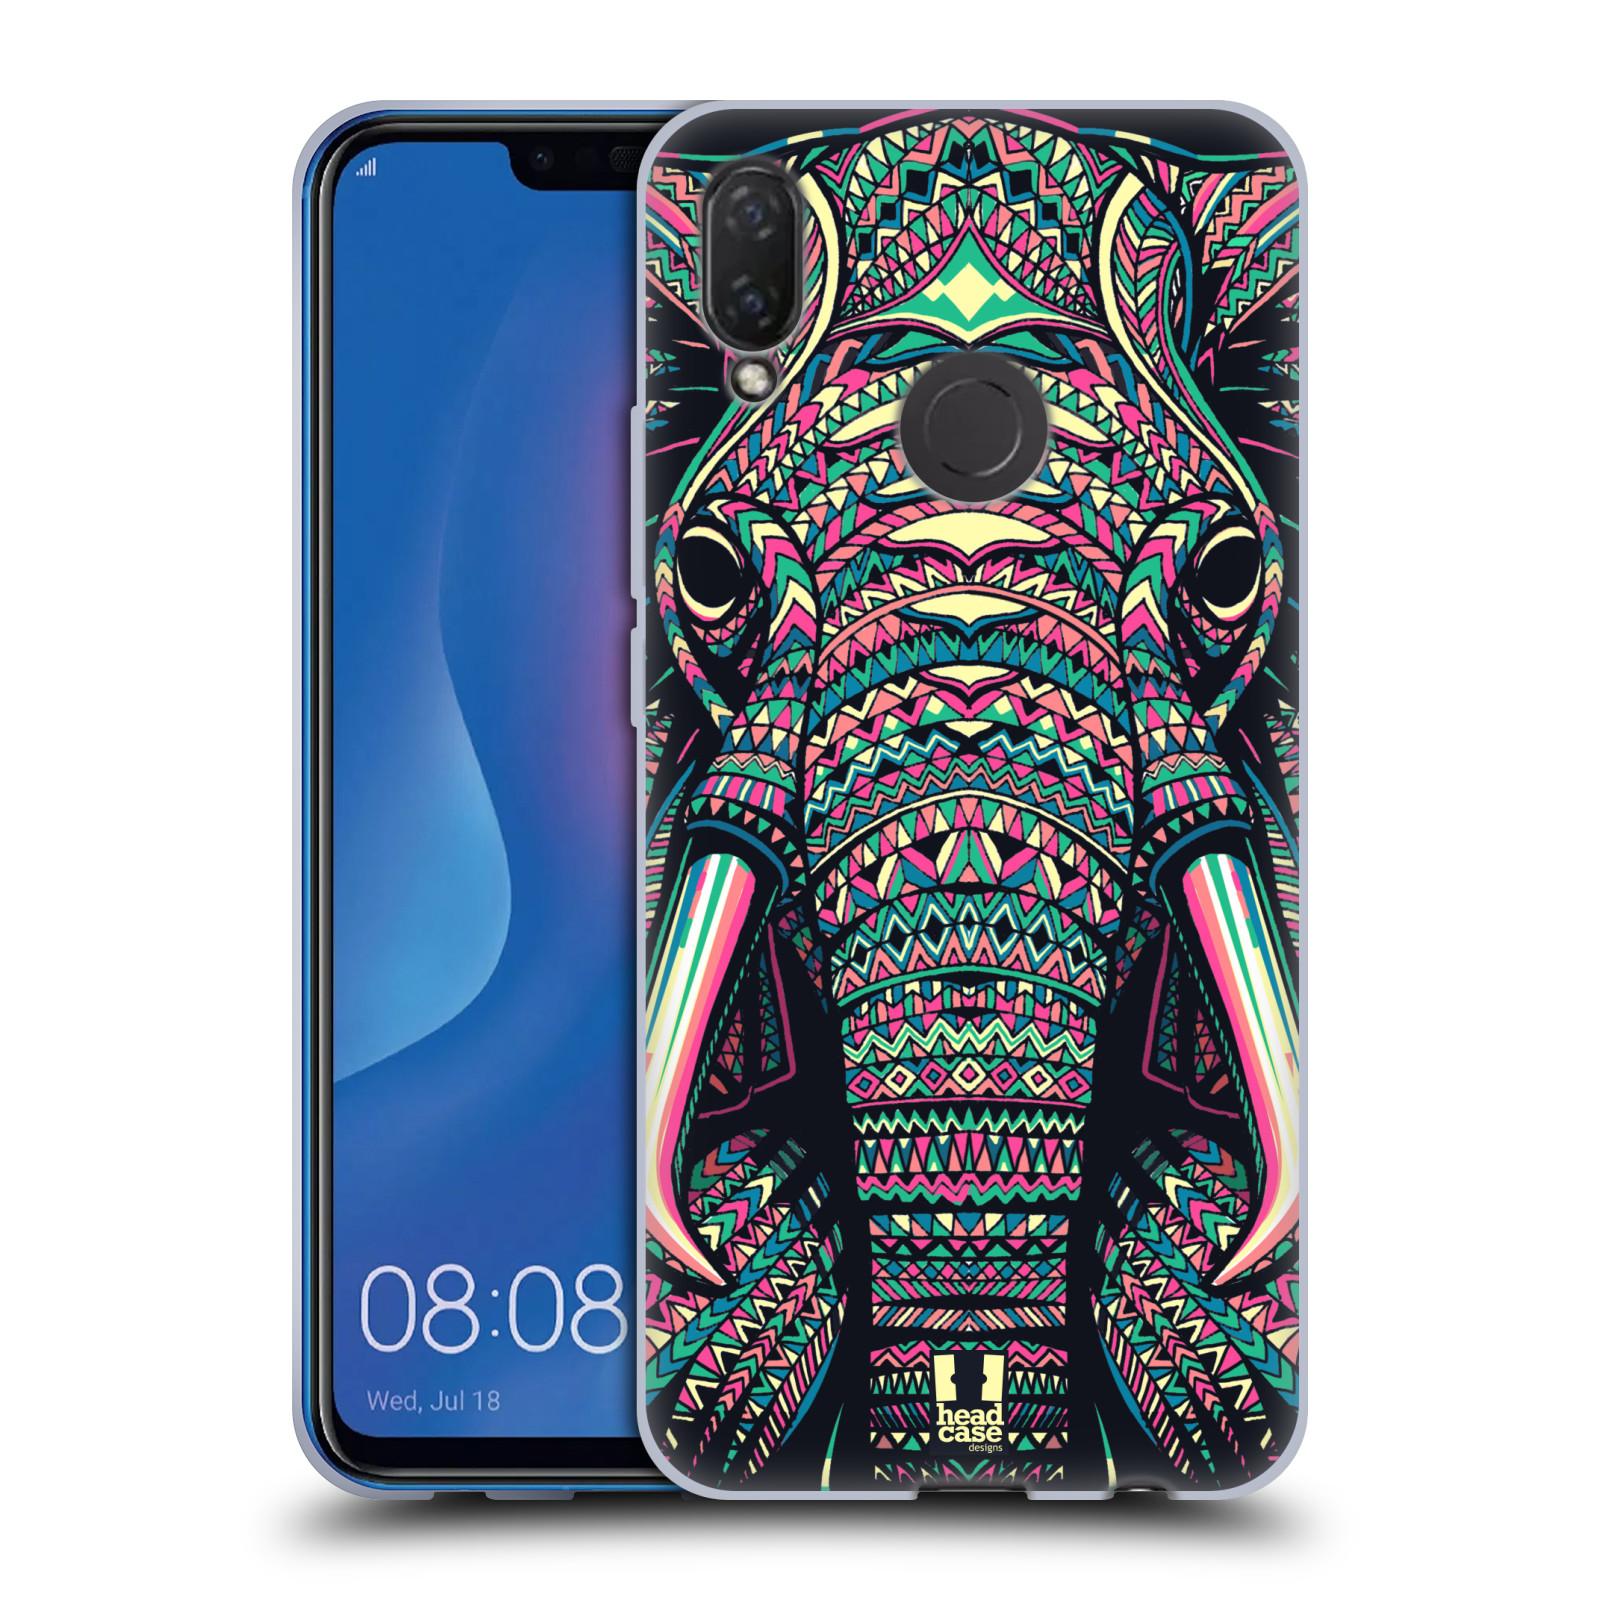 Silikonové pouzdro na mobil Huawei Nova 3i - Head Case - AZTEC SLON